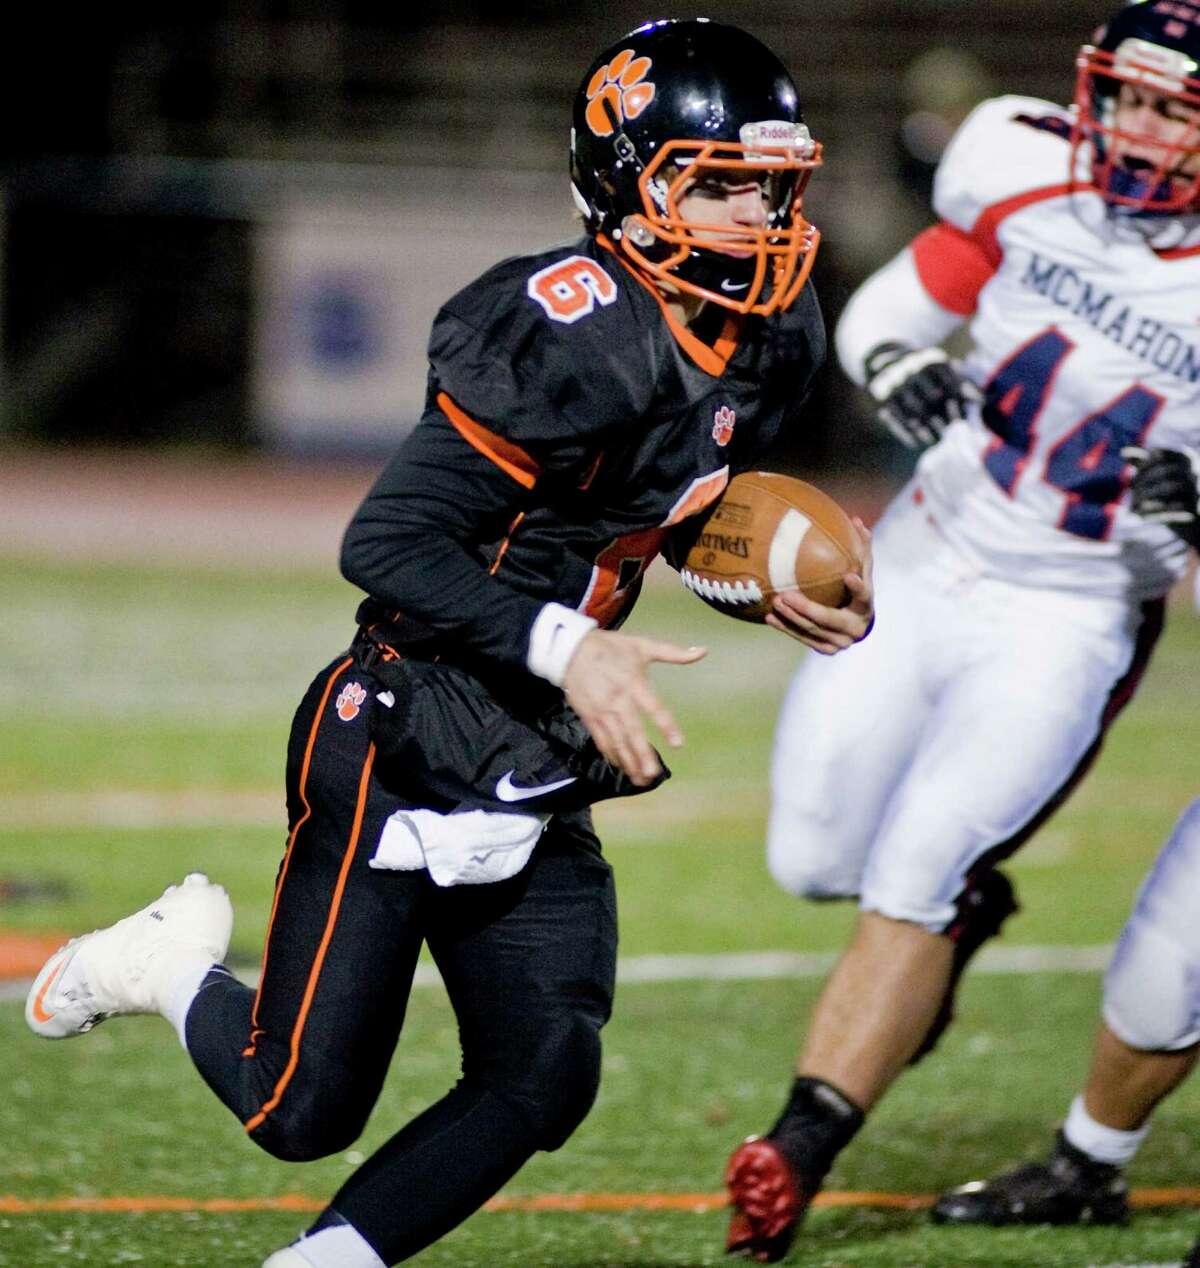 Ridgefield High School quarterback Ryan Dunn keeps the ball on a play against McMahon High School in the first quarter of a game at Ridgefield. Friday, Nov. 8, 2013